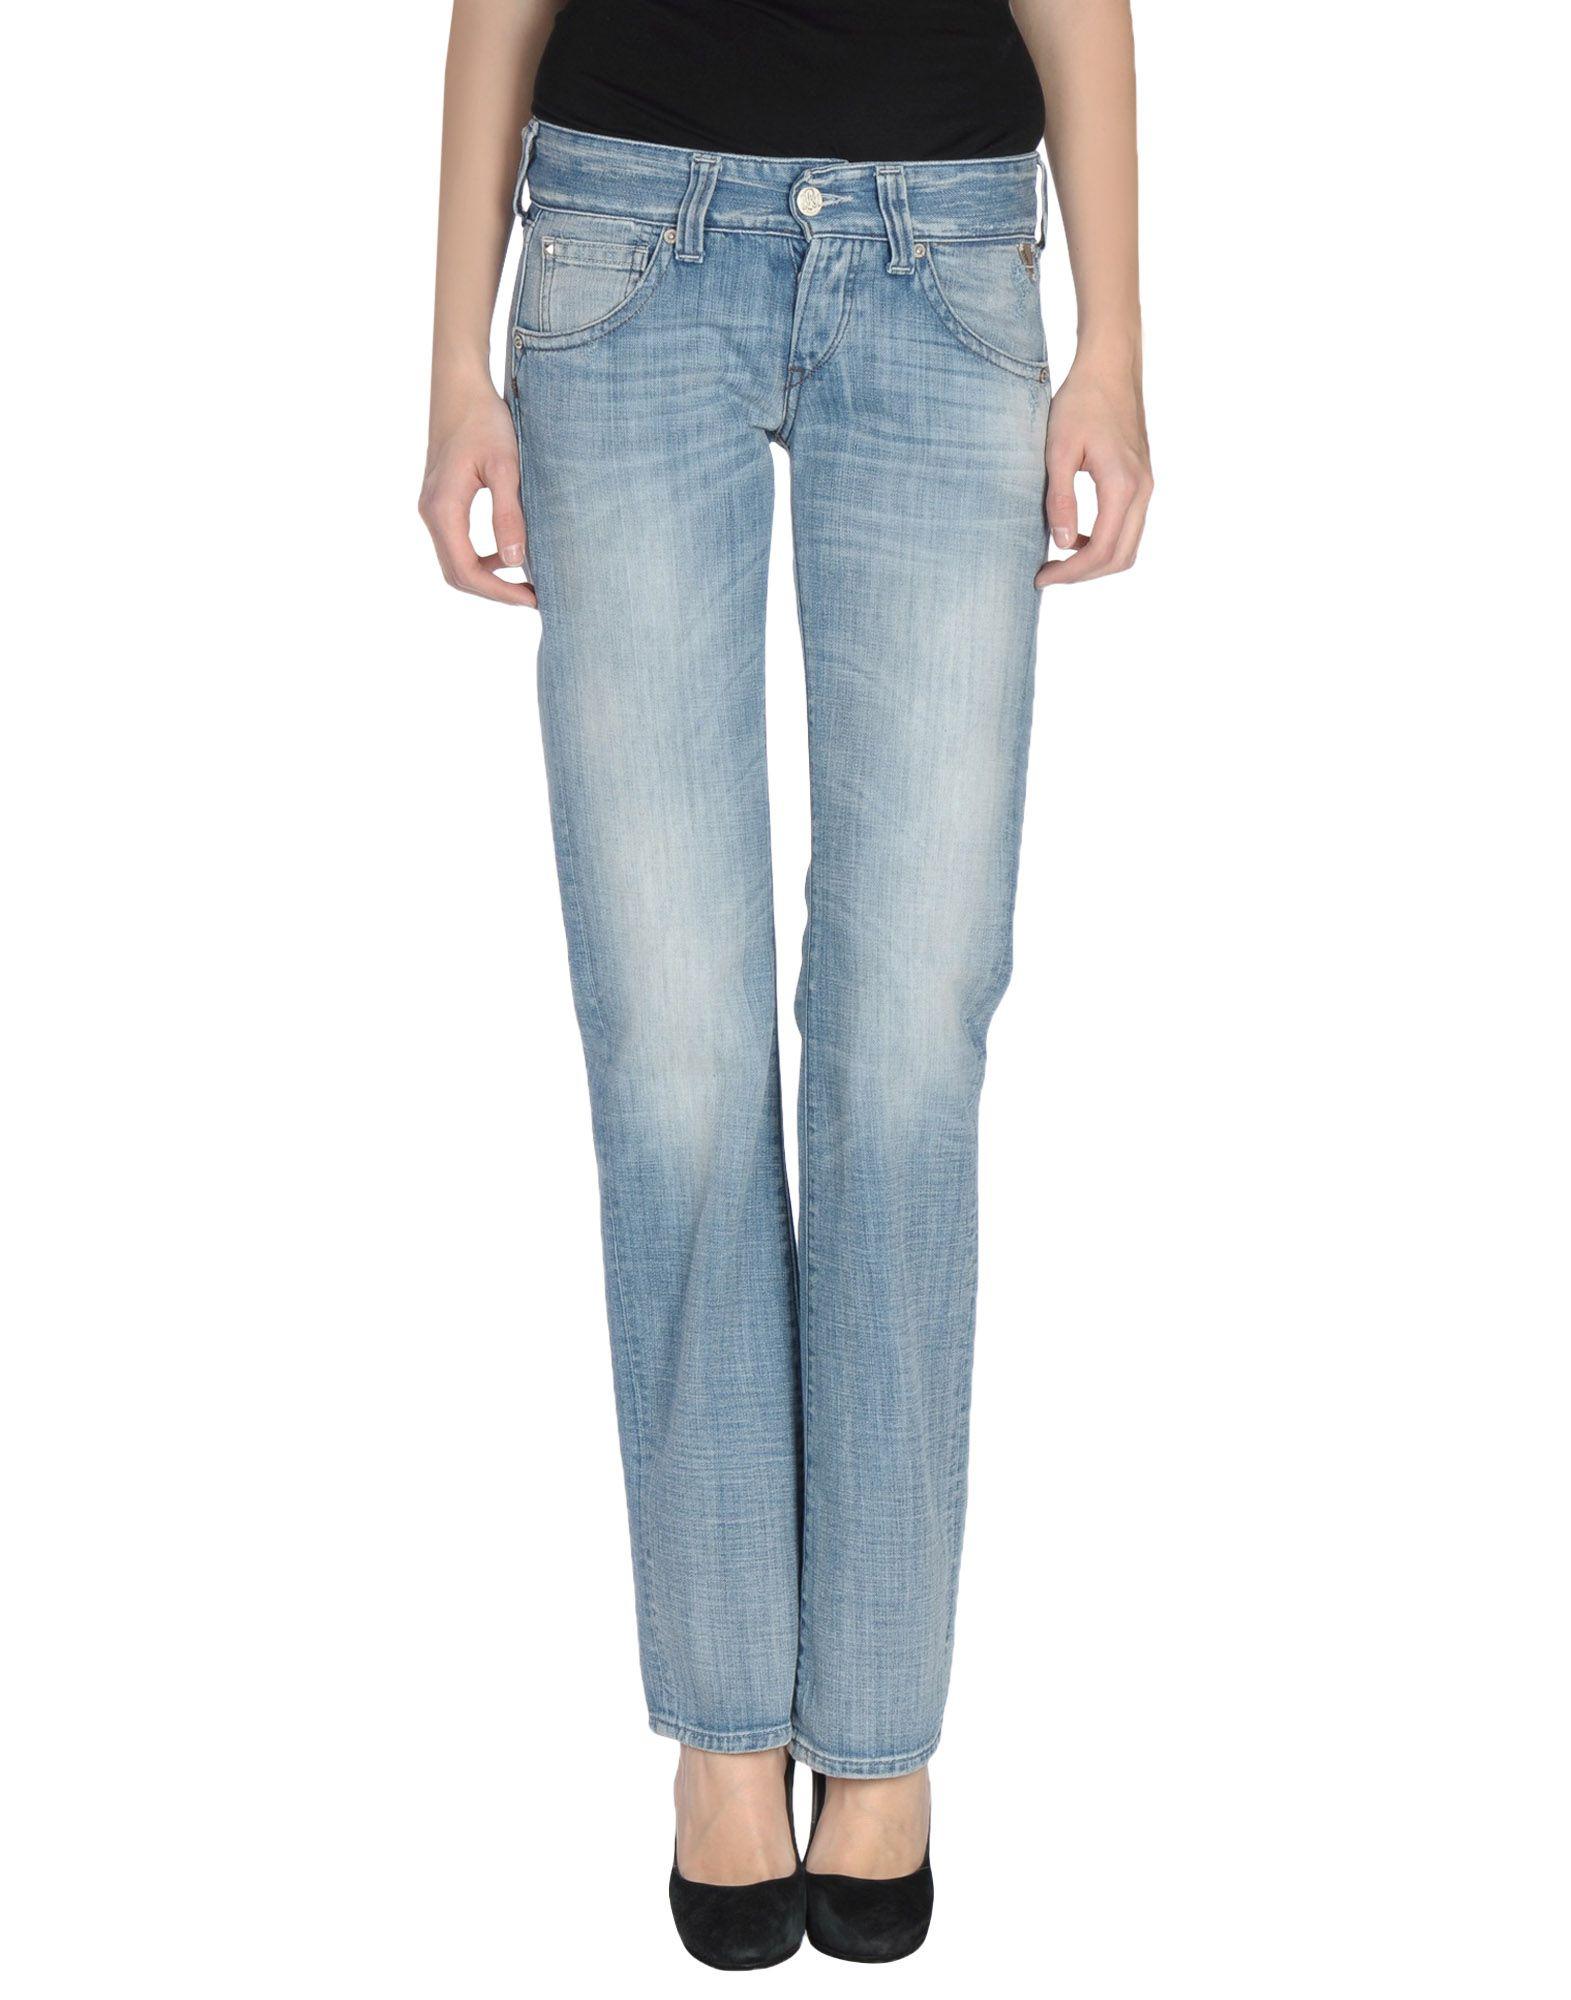 Lyst - Replay Denim Pants in Blue